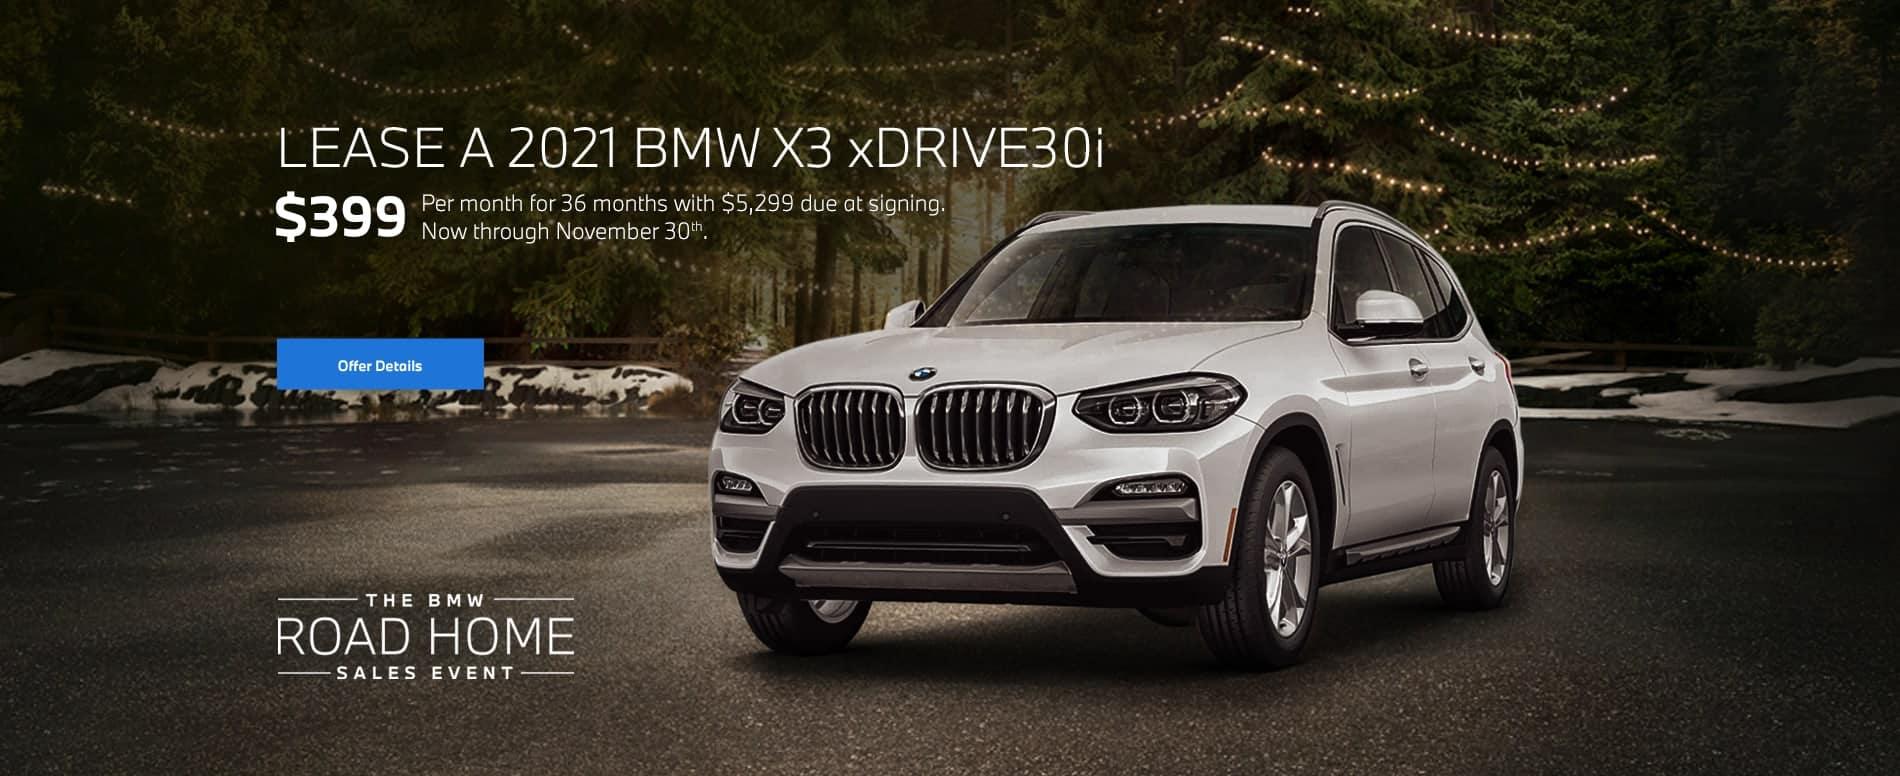 2021 BMW X3 xDrive30i Lease for $399/mo